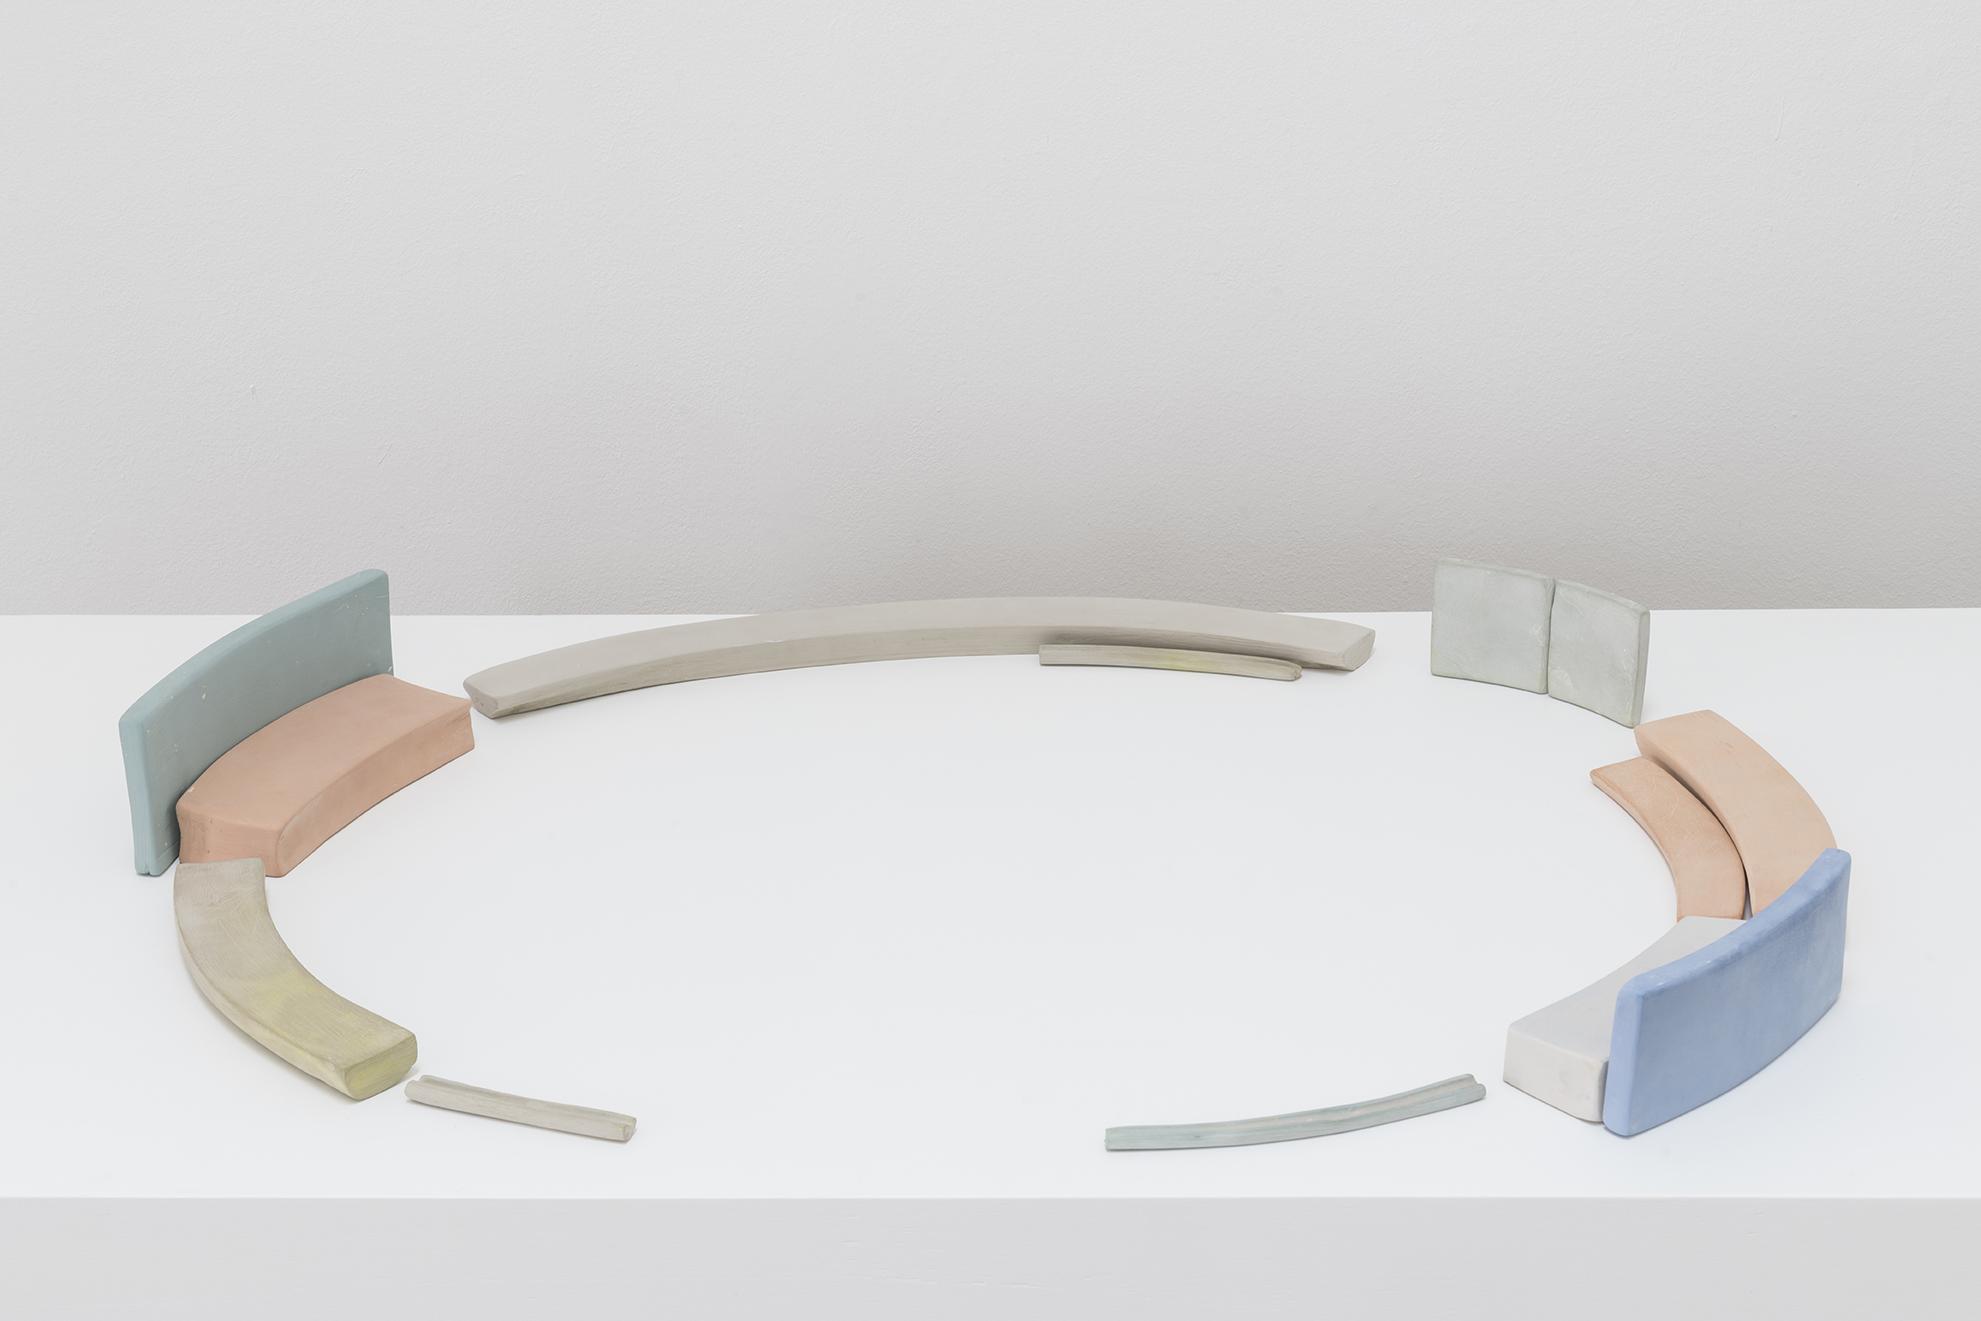 PATRICIA DAUDER.Model #6 (Elliptical system. Day and Night), 2016 | Accrochage #4: Dauder, Jotta, Mendizabal & Oriol Aribau | ProjecteSD